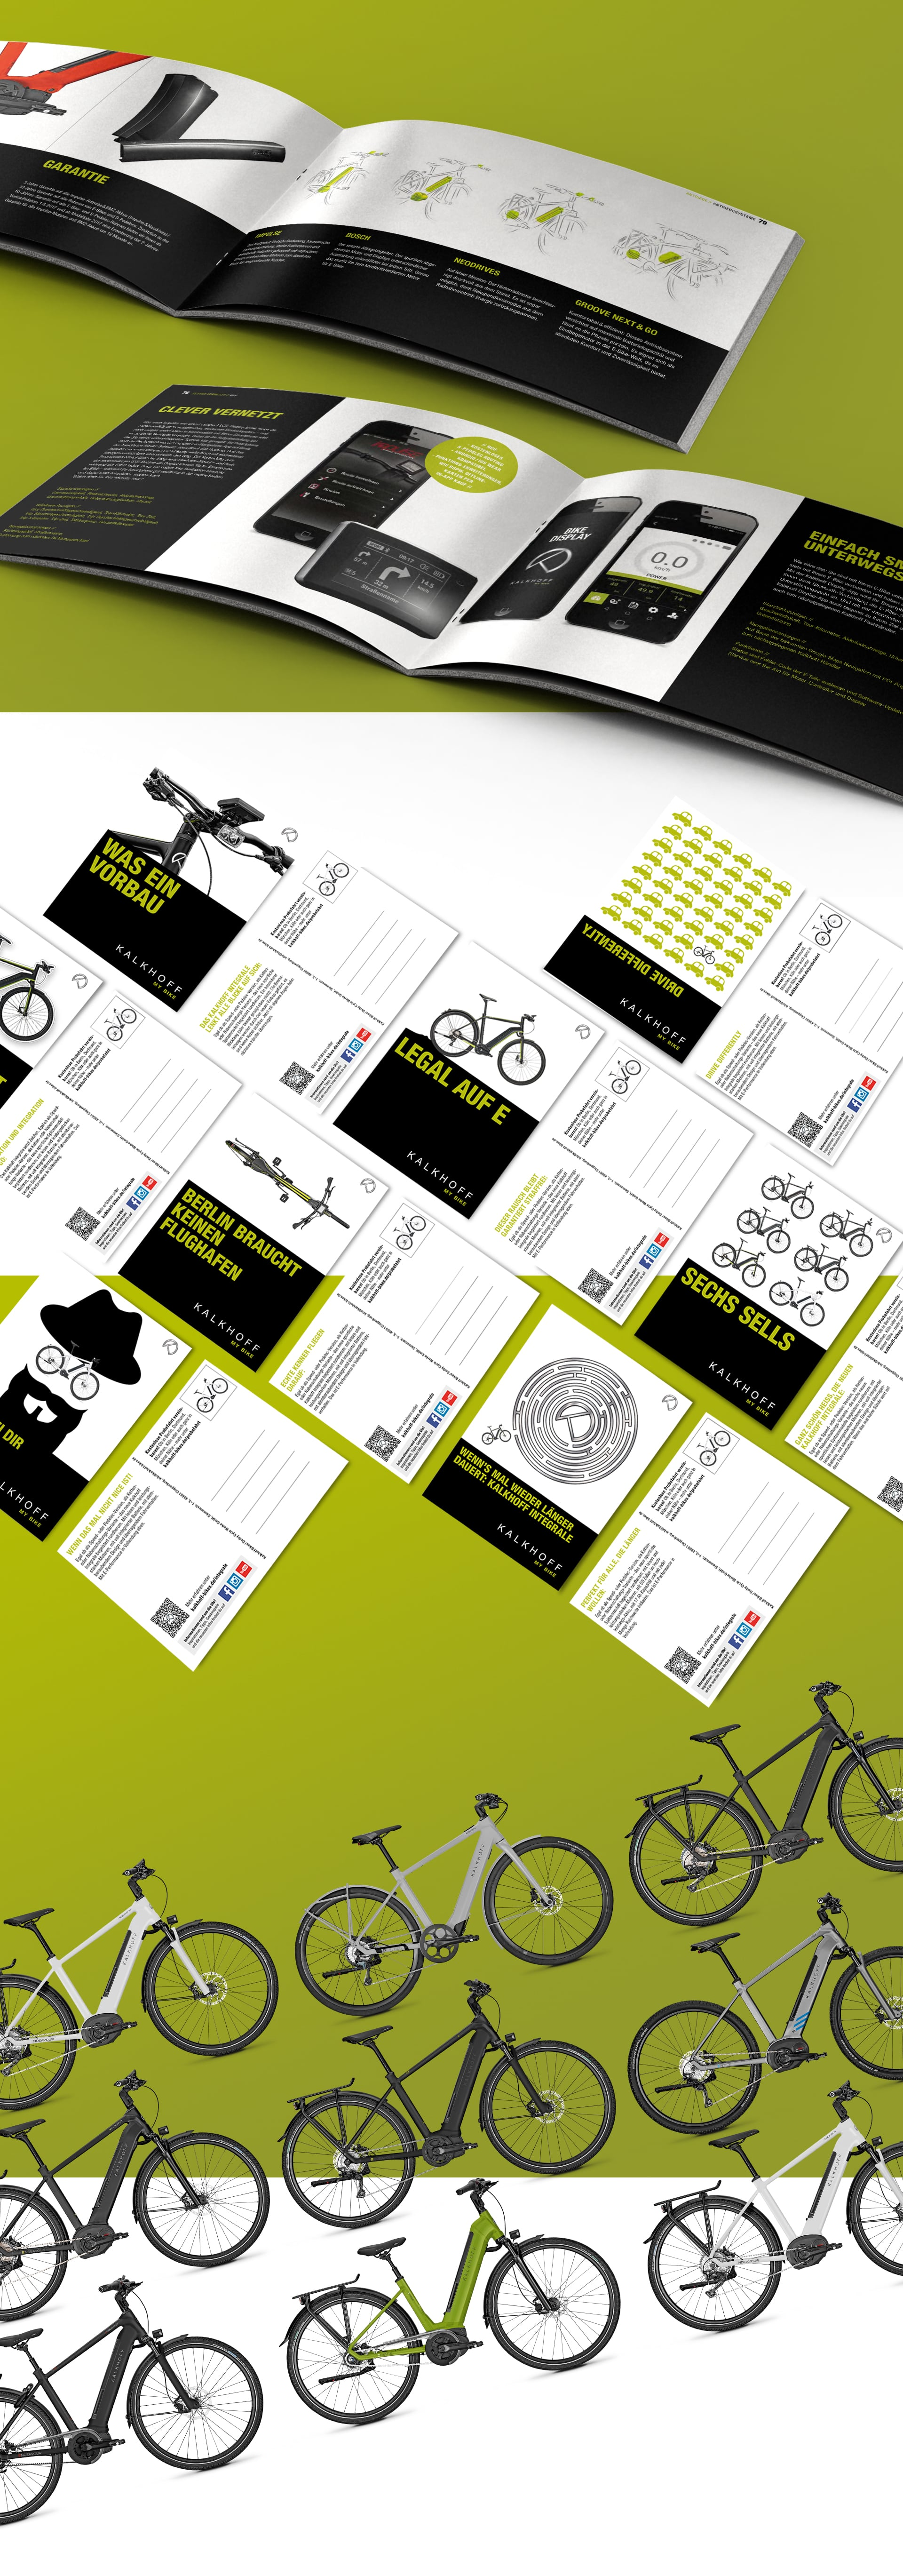 Case Kalkhoff Integrale Fahrrad